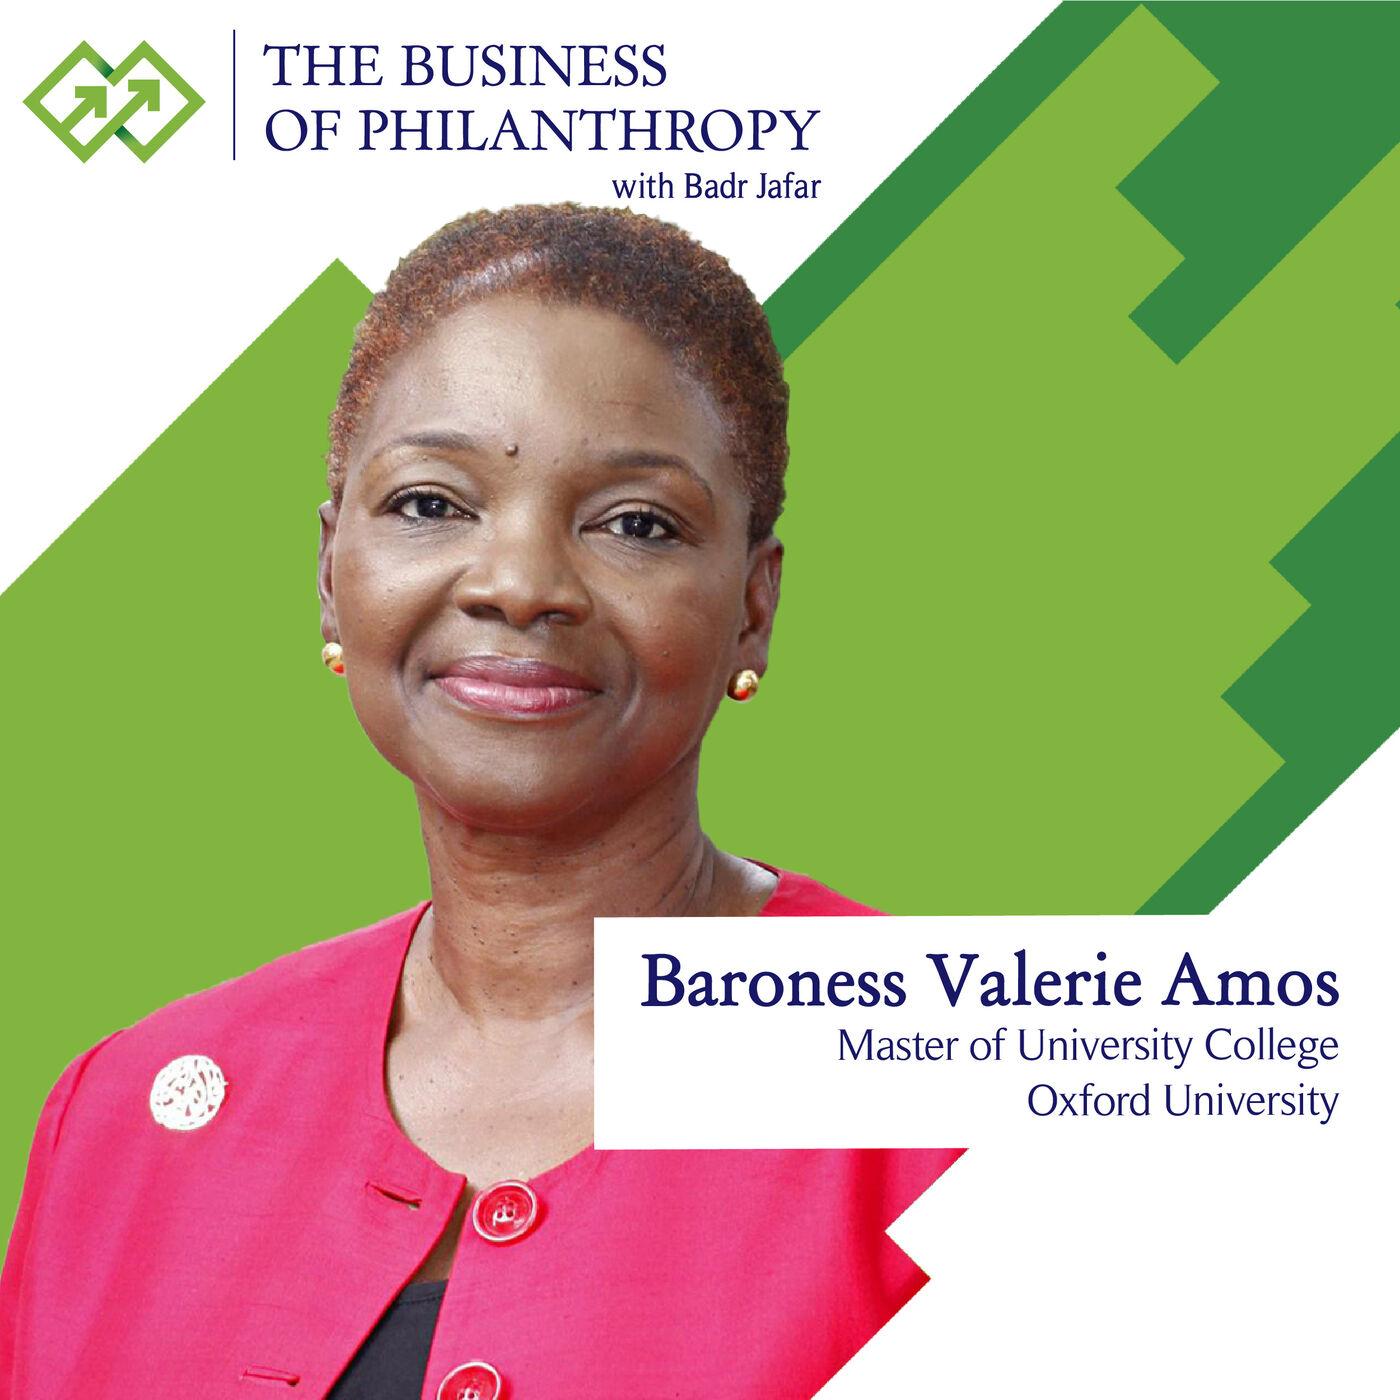 Baroness Valerie Amos; A Conversation with Badr Jafar